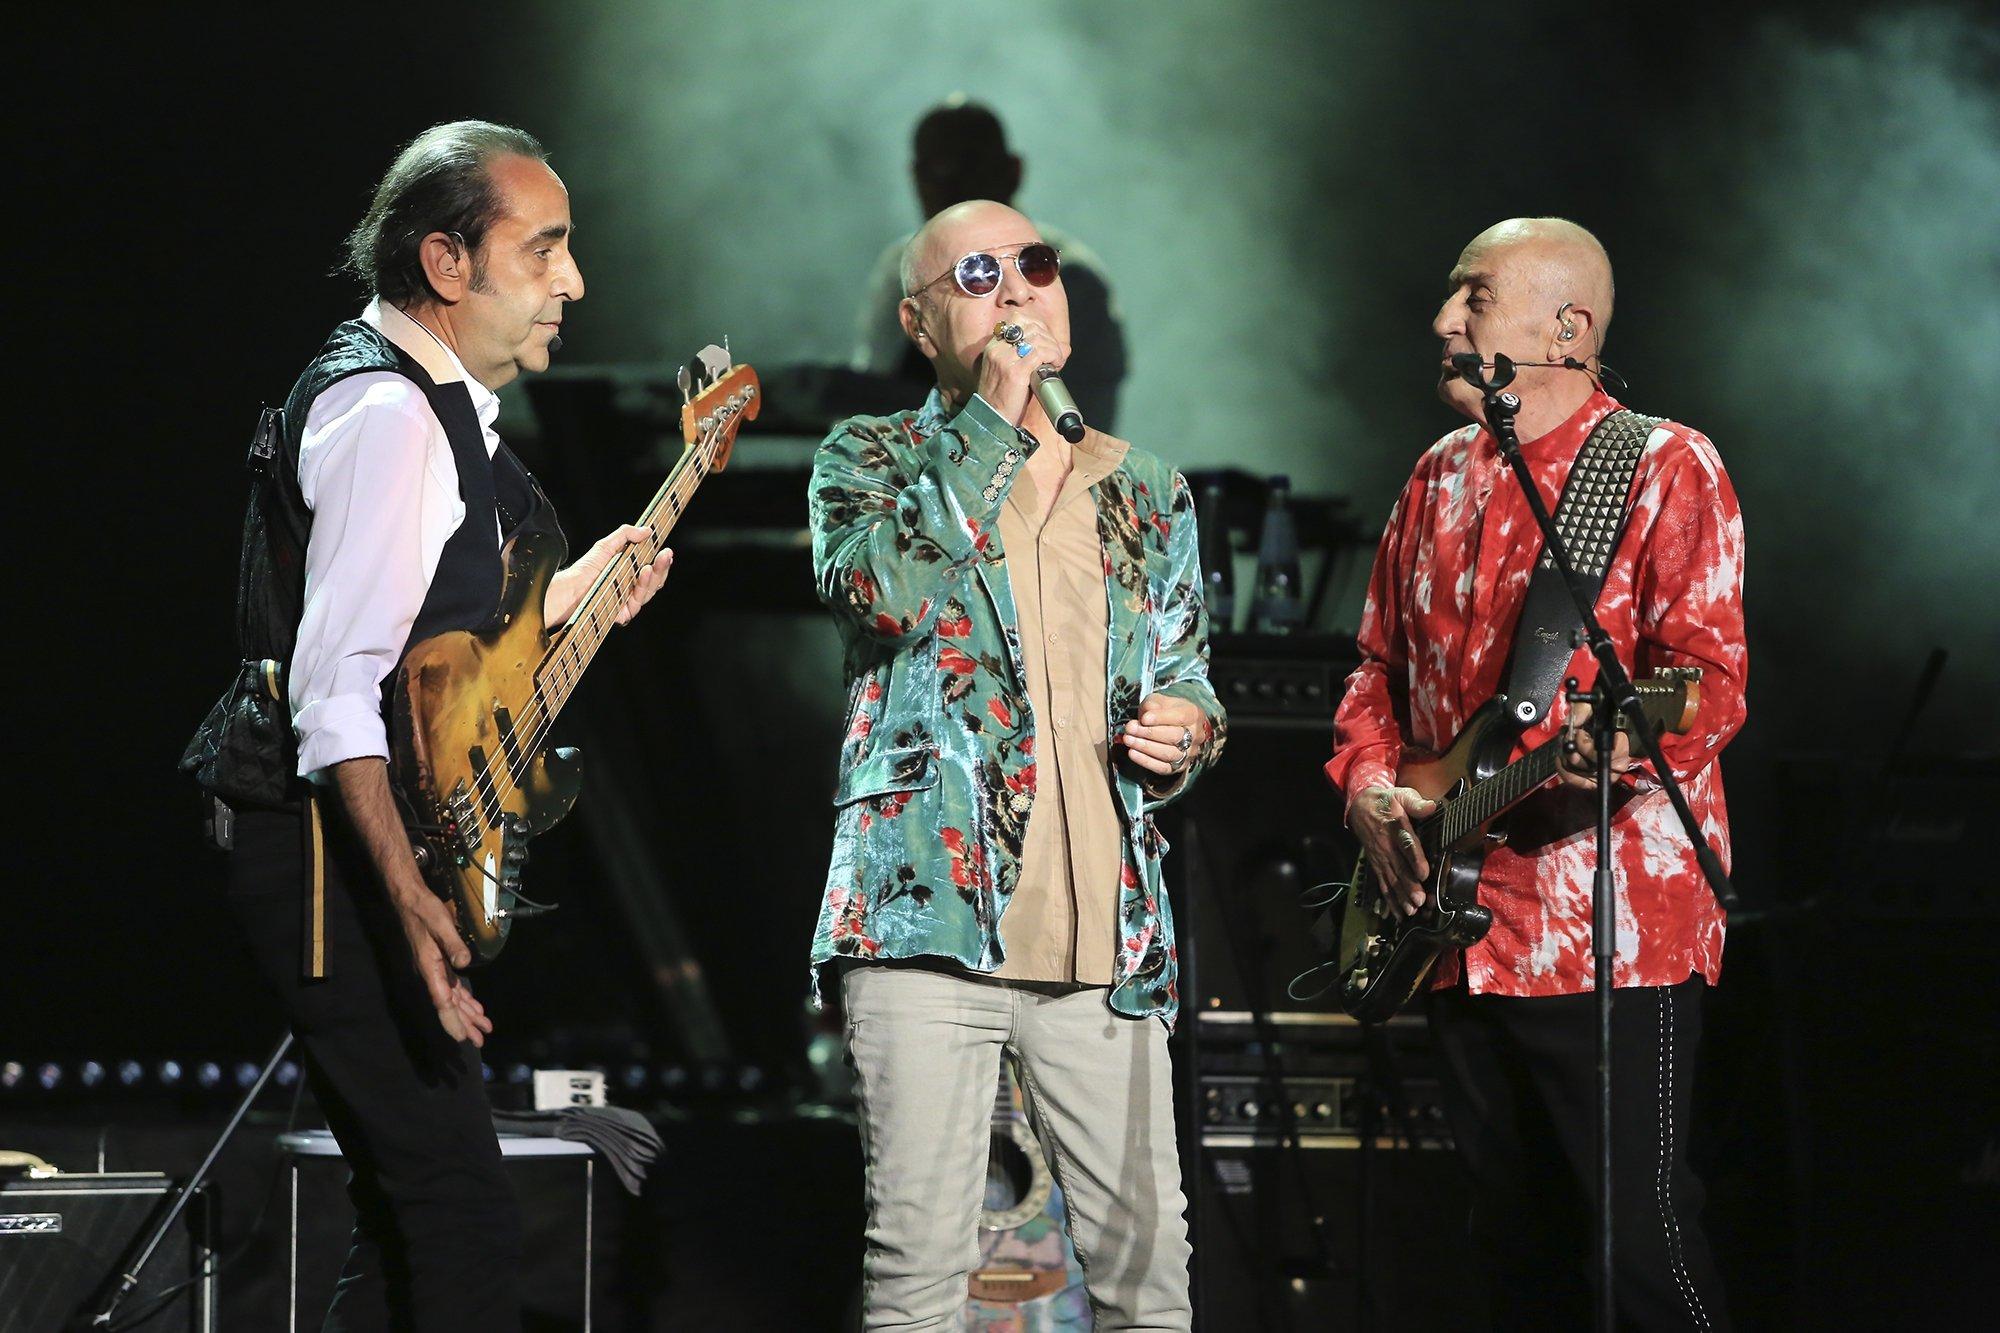 Özkan (L), Mazhar (C) and Fuat from the music group MFÖ performs at the Harbiye Cemil Topuzlu Open-Air Theater in Şişli, Istanbul, August 8, 2019. (SABAH/Günaydın File Photo)